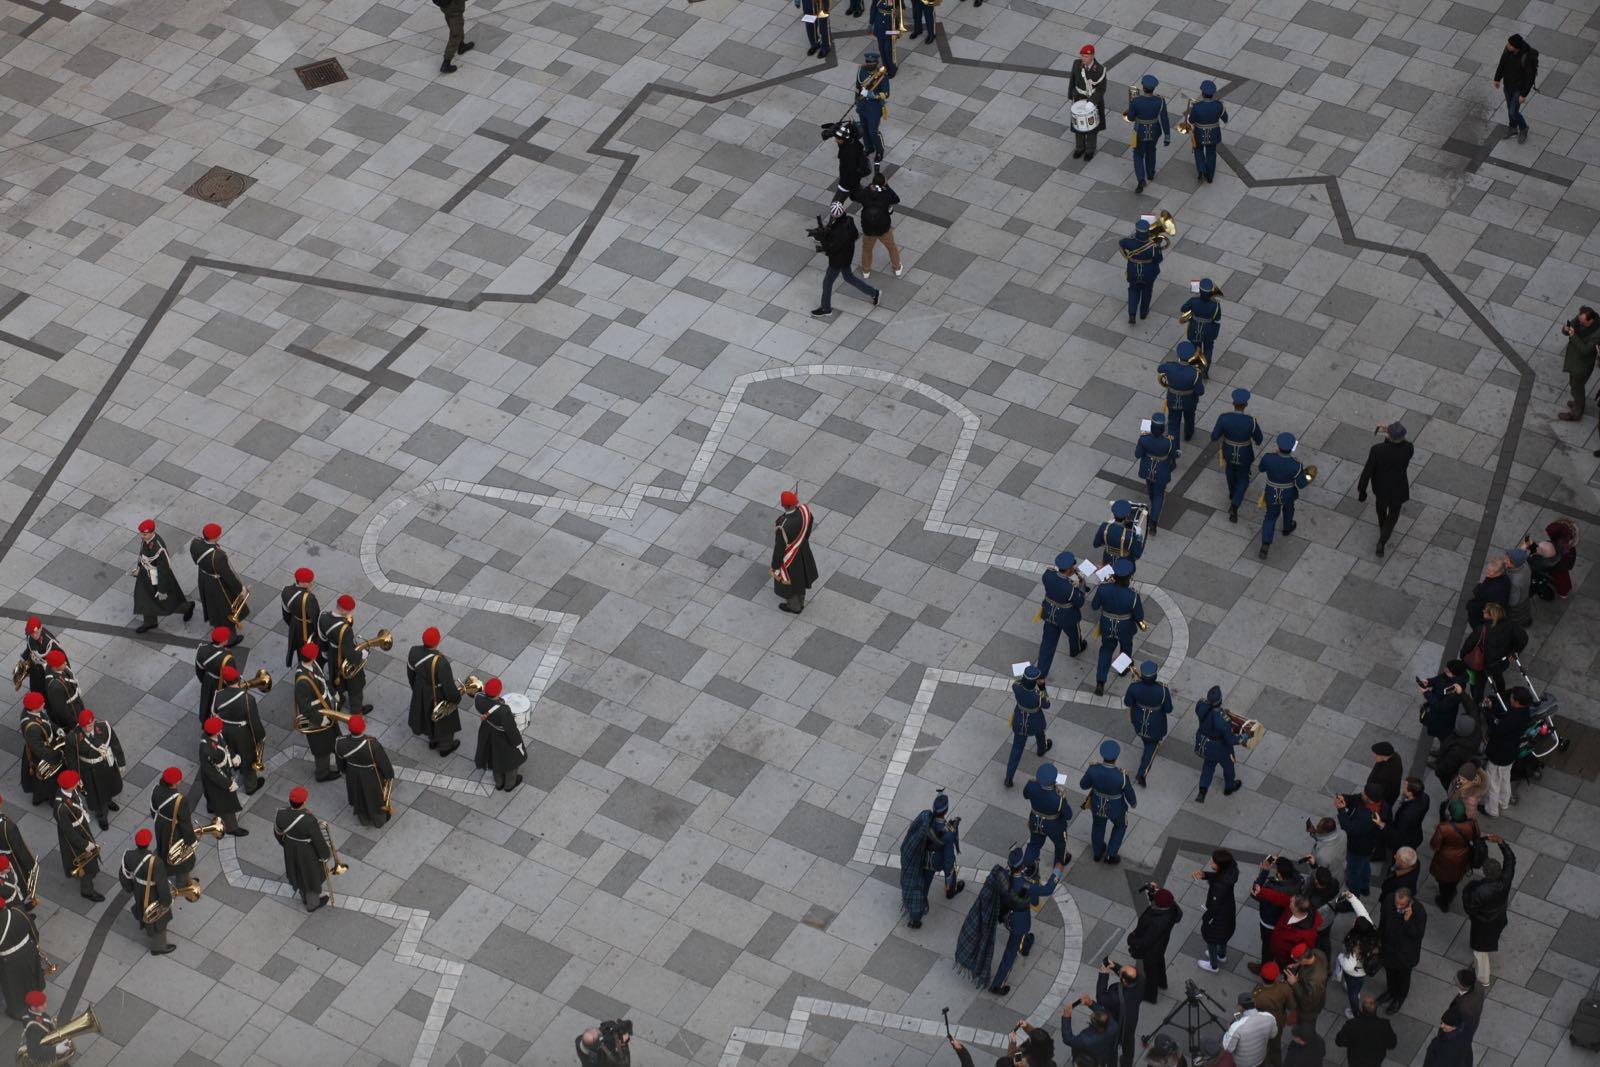 2019_01_16_Gardemusik_Oman_Flashmob_BallderOffiziere - 3 of 36